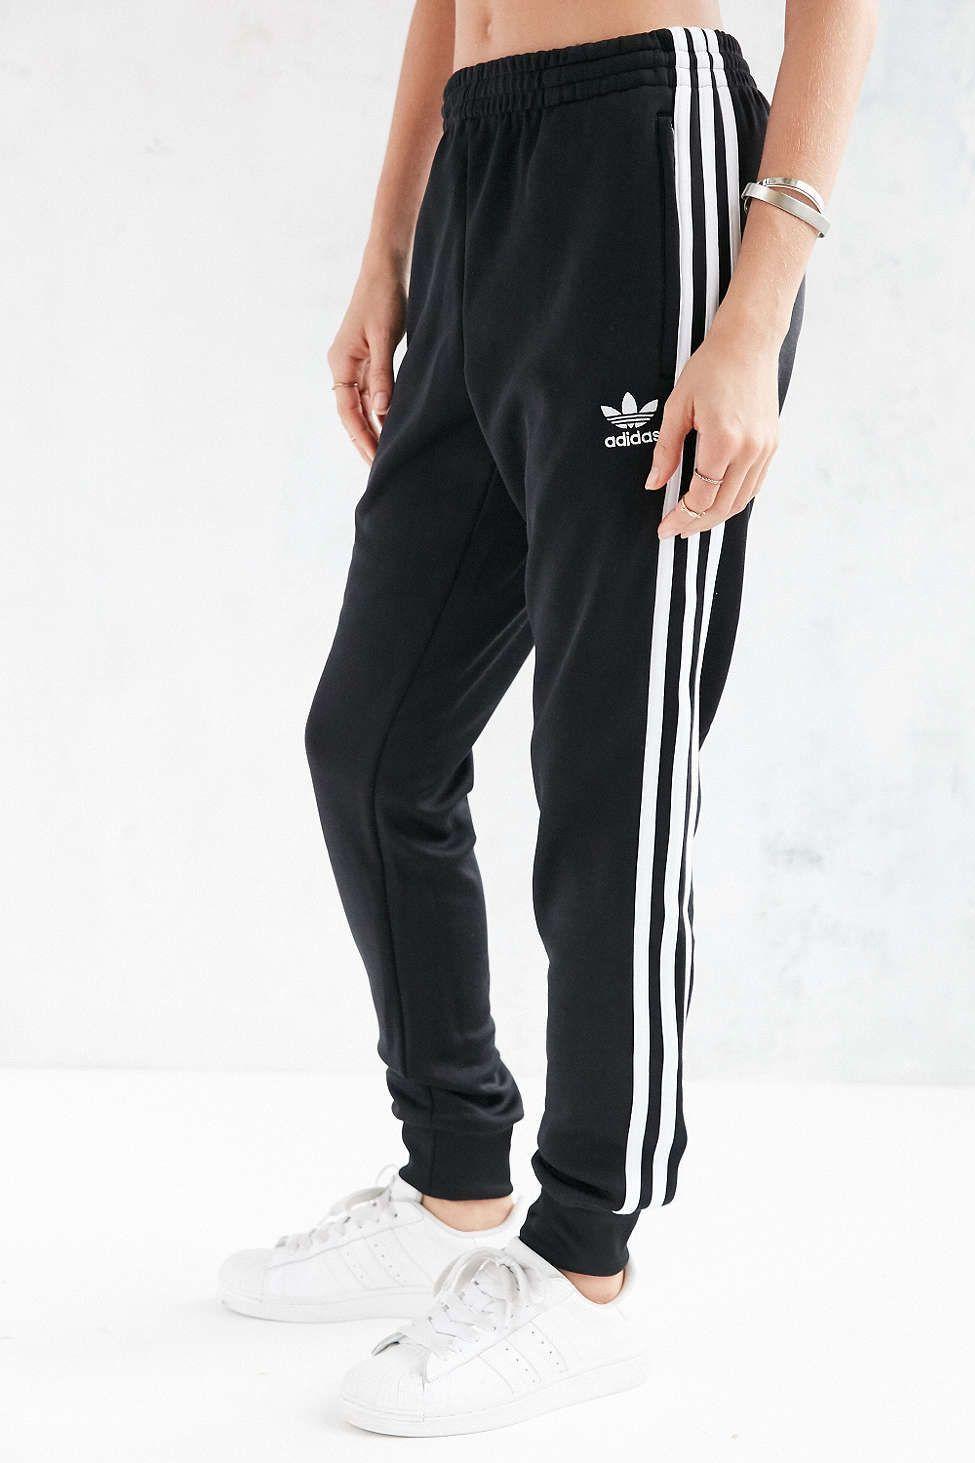 lowest price d39dd 341a1 adidas Originals Unisex Superstar Cuff Track Pant